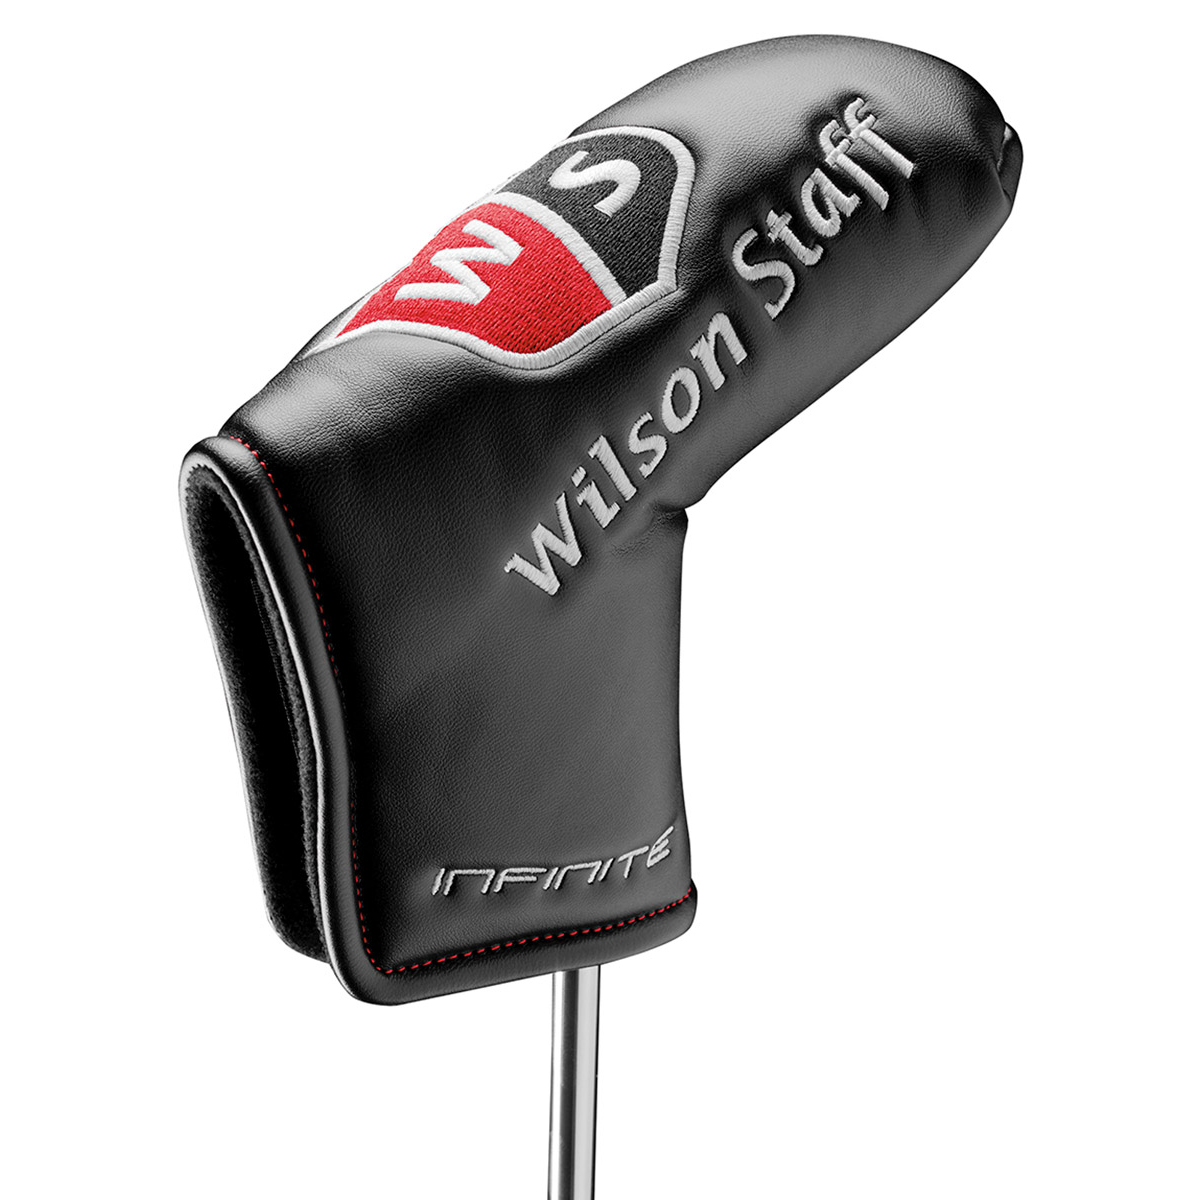 Wilson Staff Infinite Bean Putter From American Golf